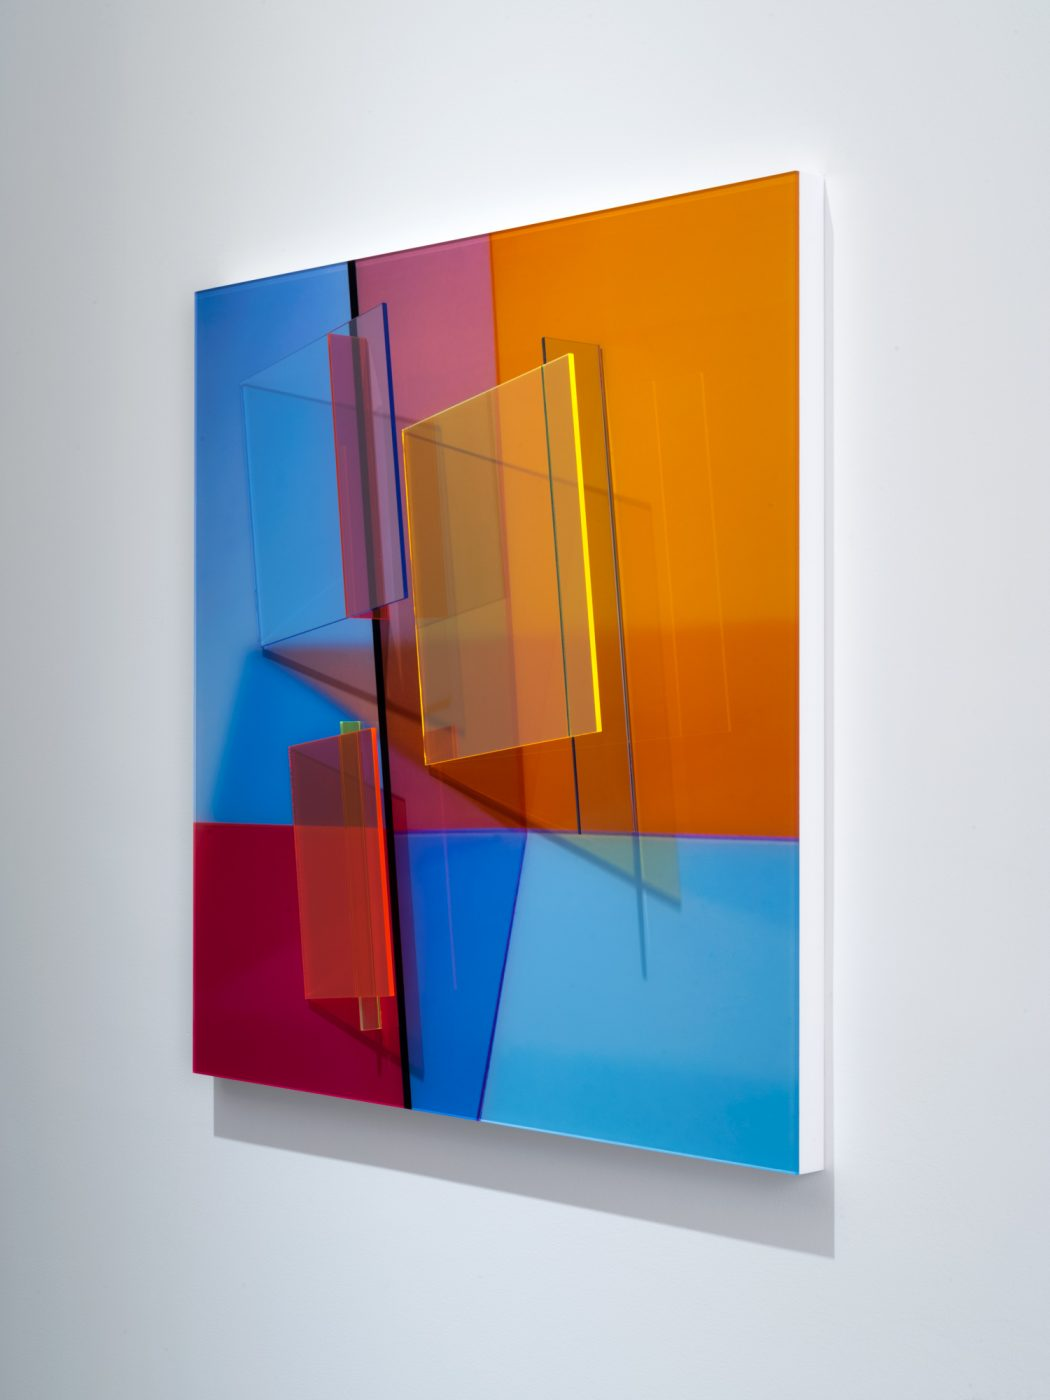 Barbara Kasten,  Progression One , 2017, Fujiflex digital print, fluorescent acrylic, 36 x 36 x 5 5/8 inches